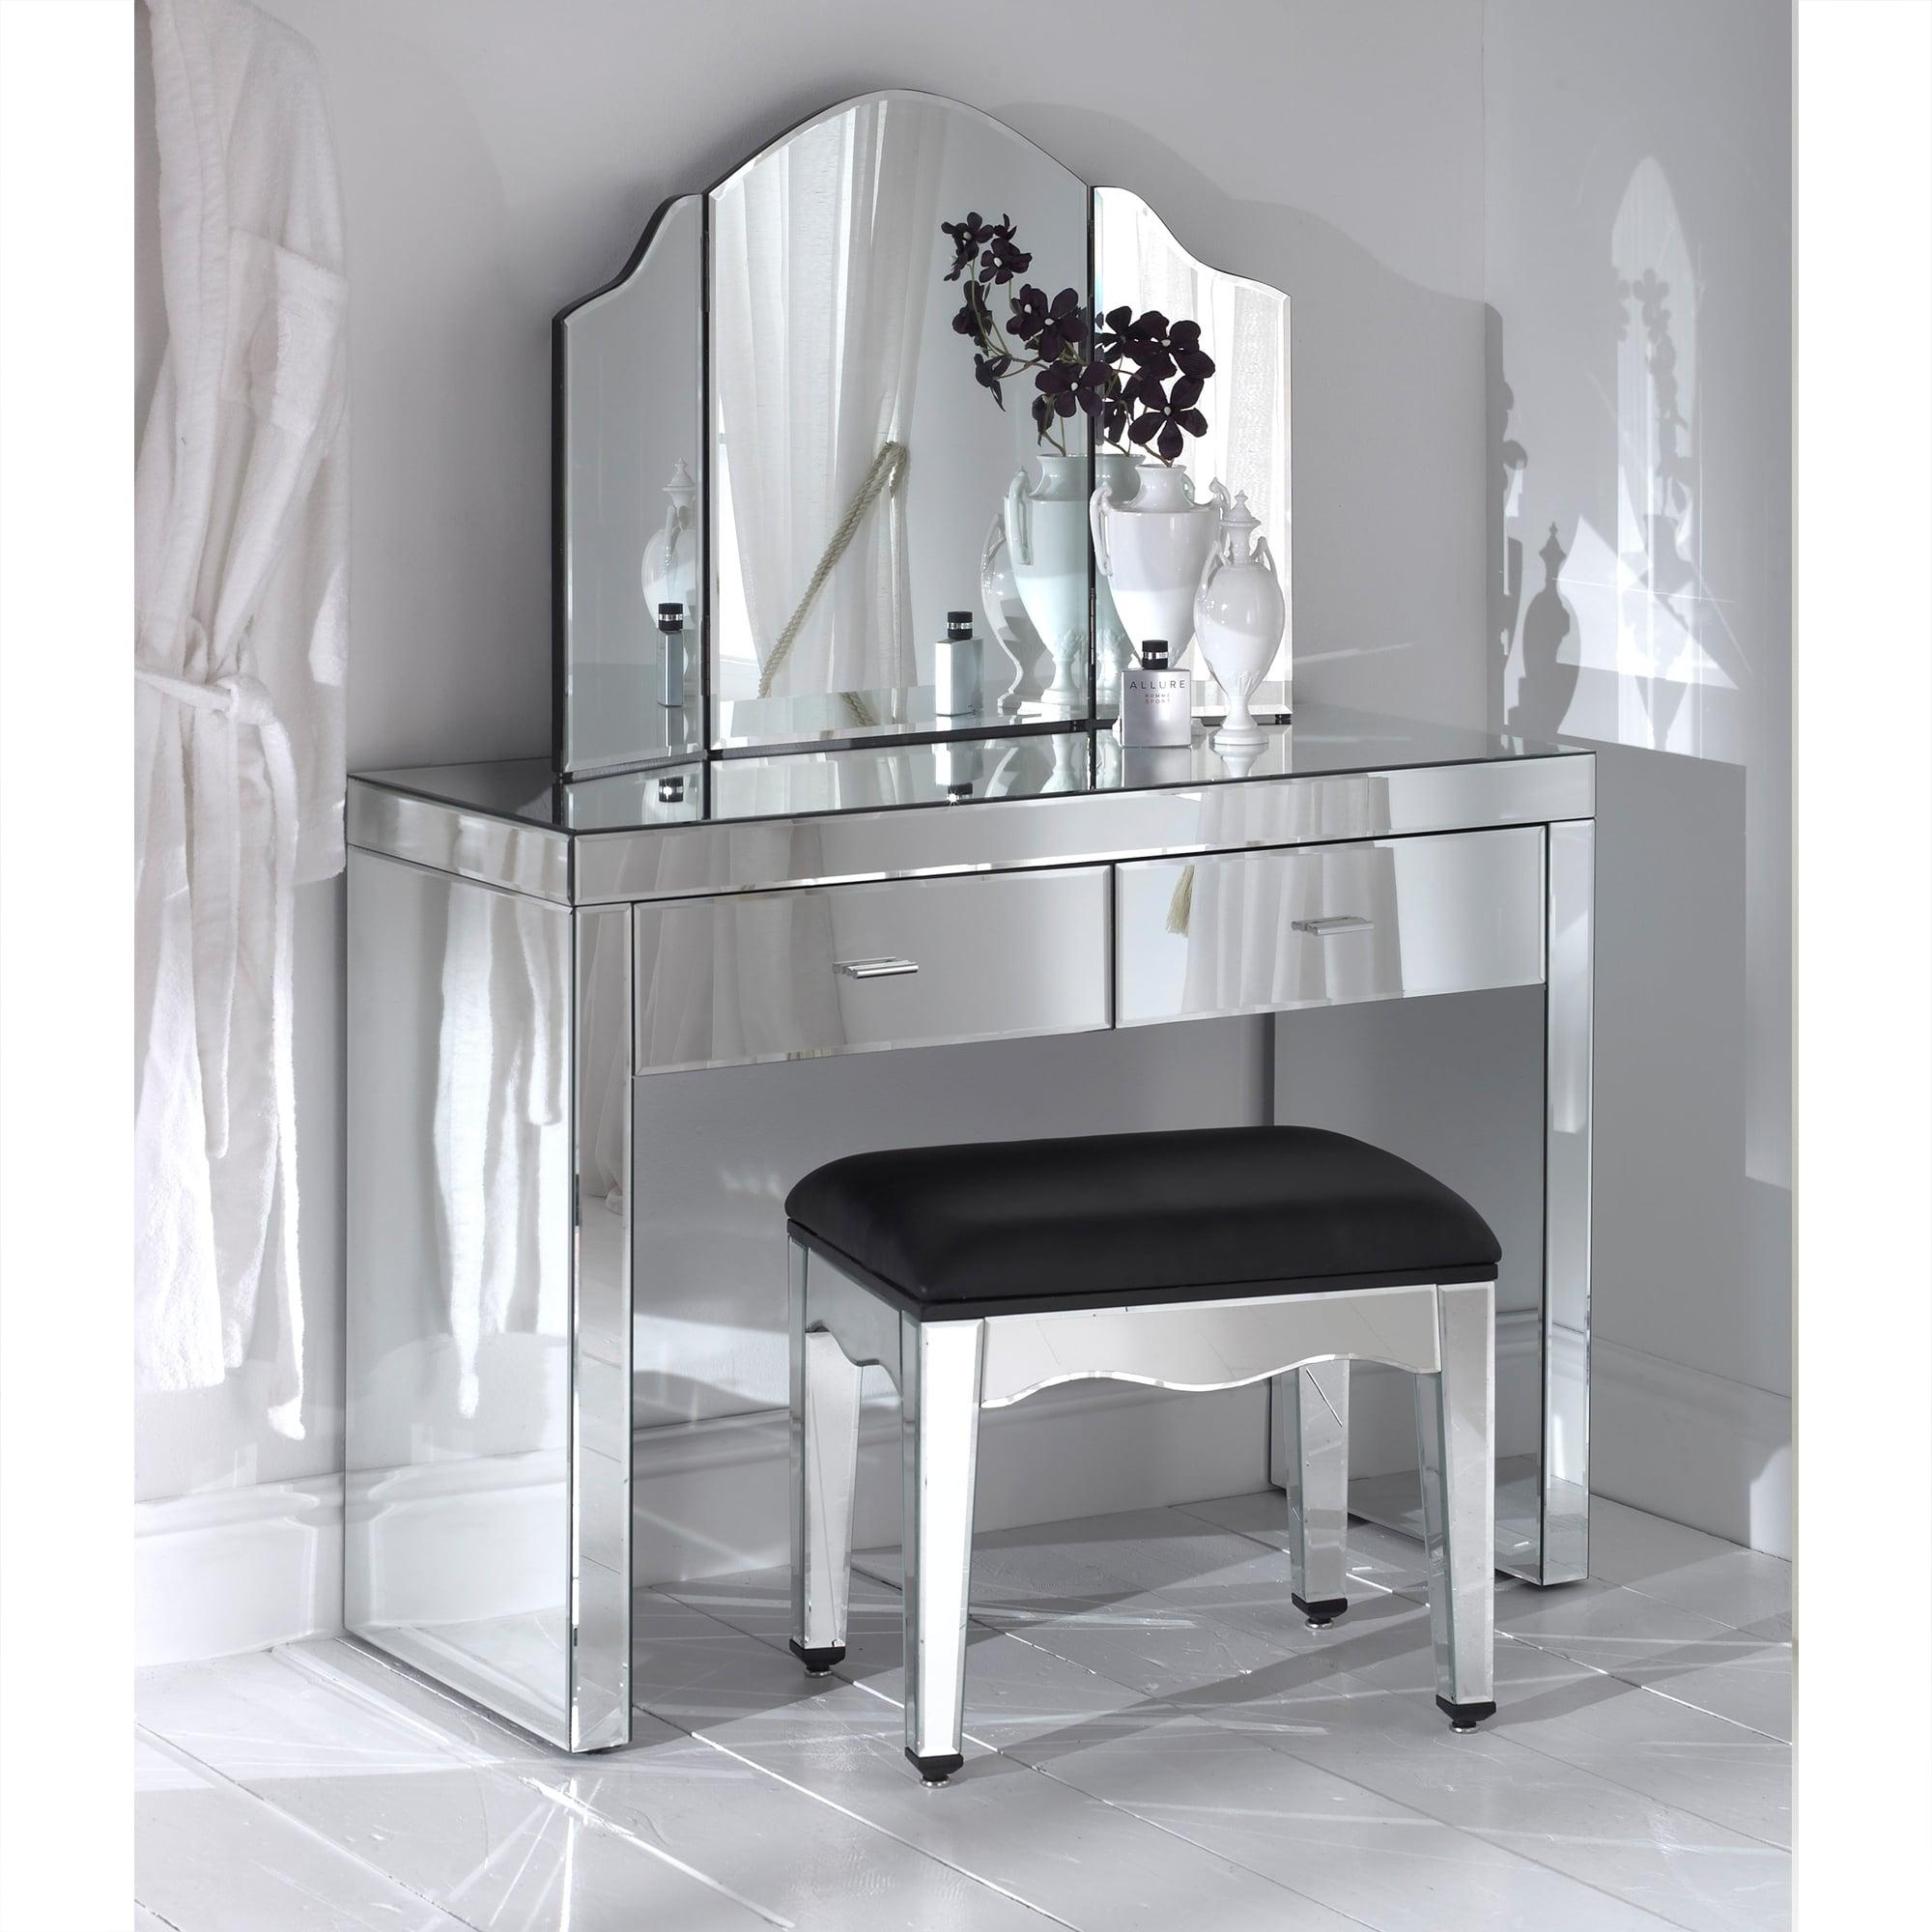 Mirrored Dressing Table romano mirrored dressing table set VIJJDOK